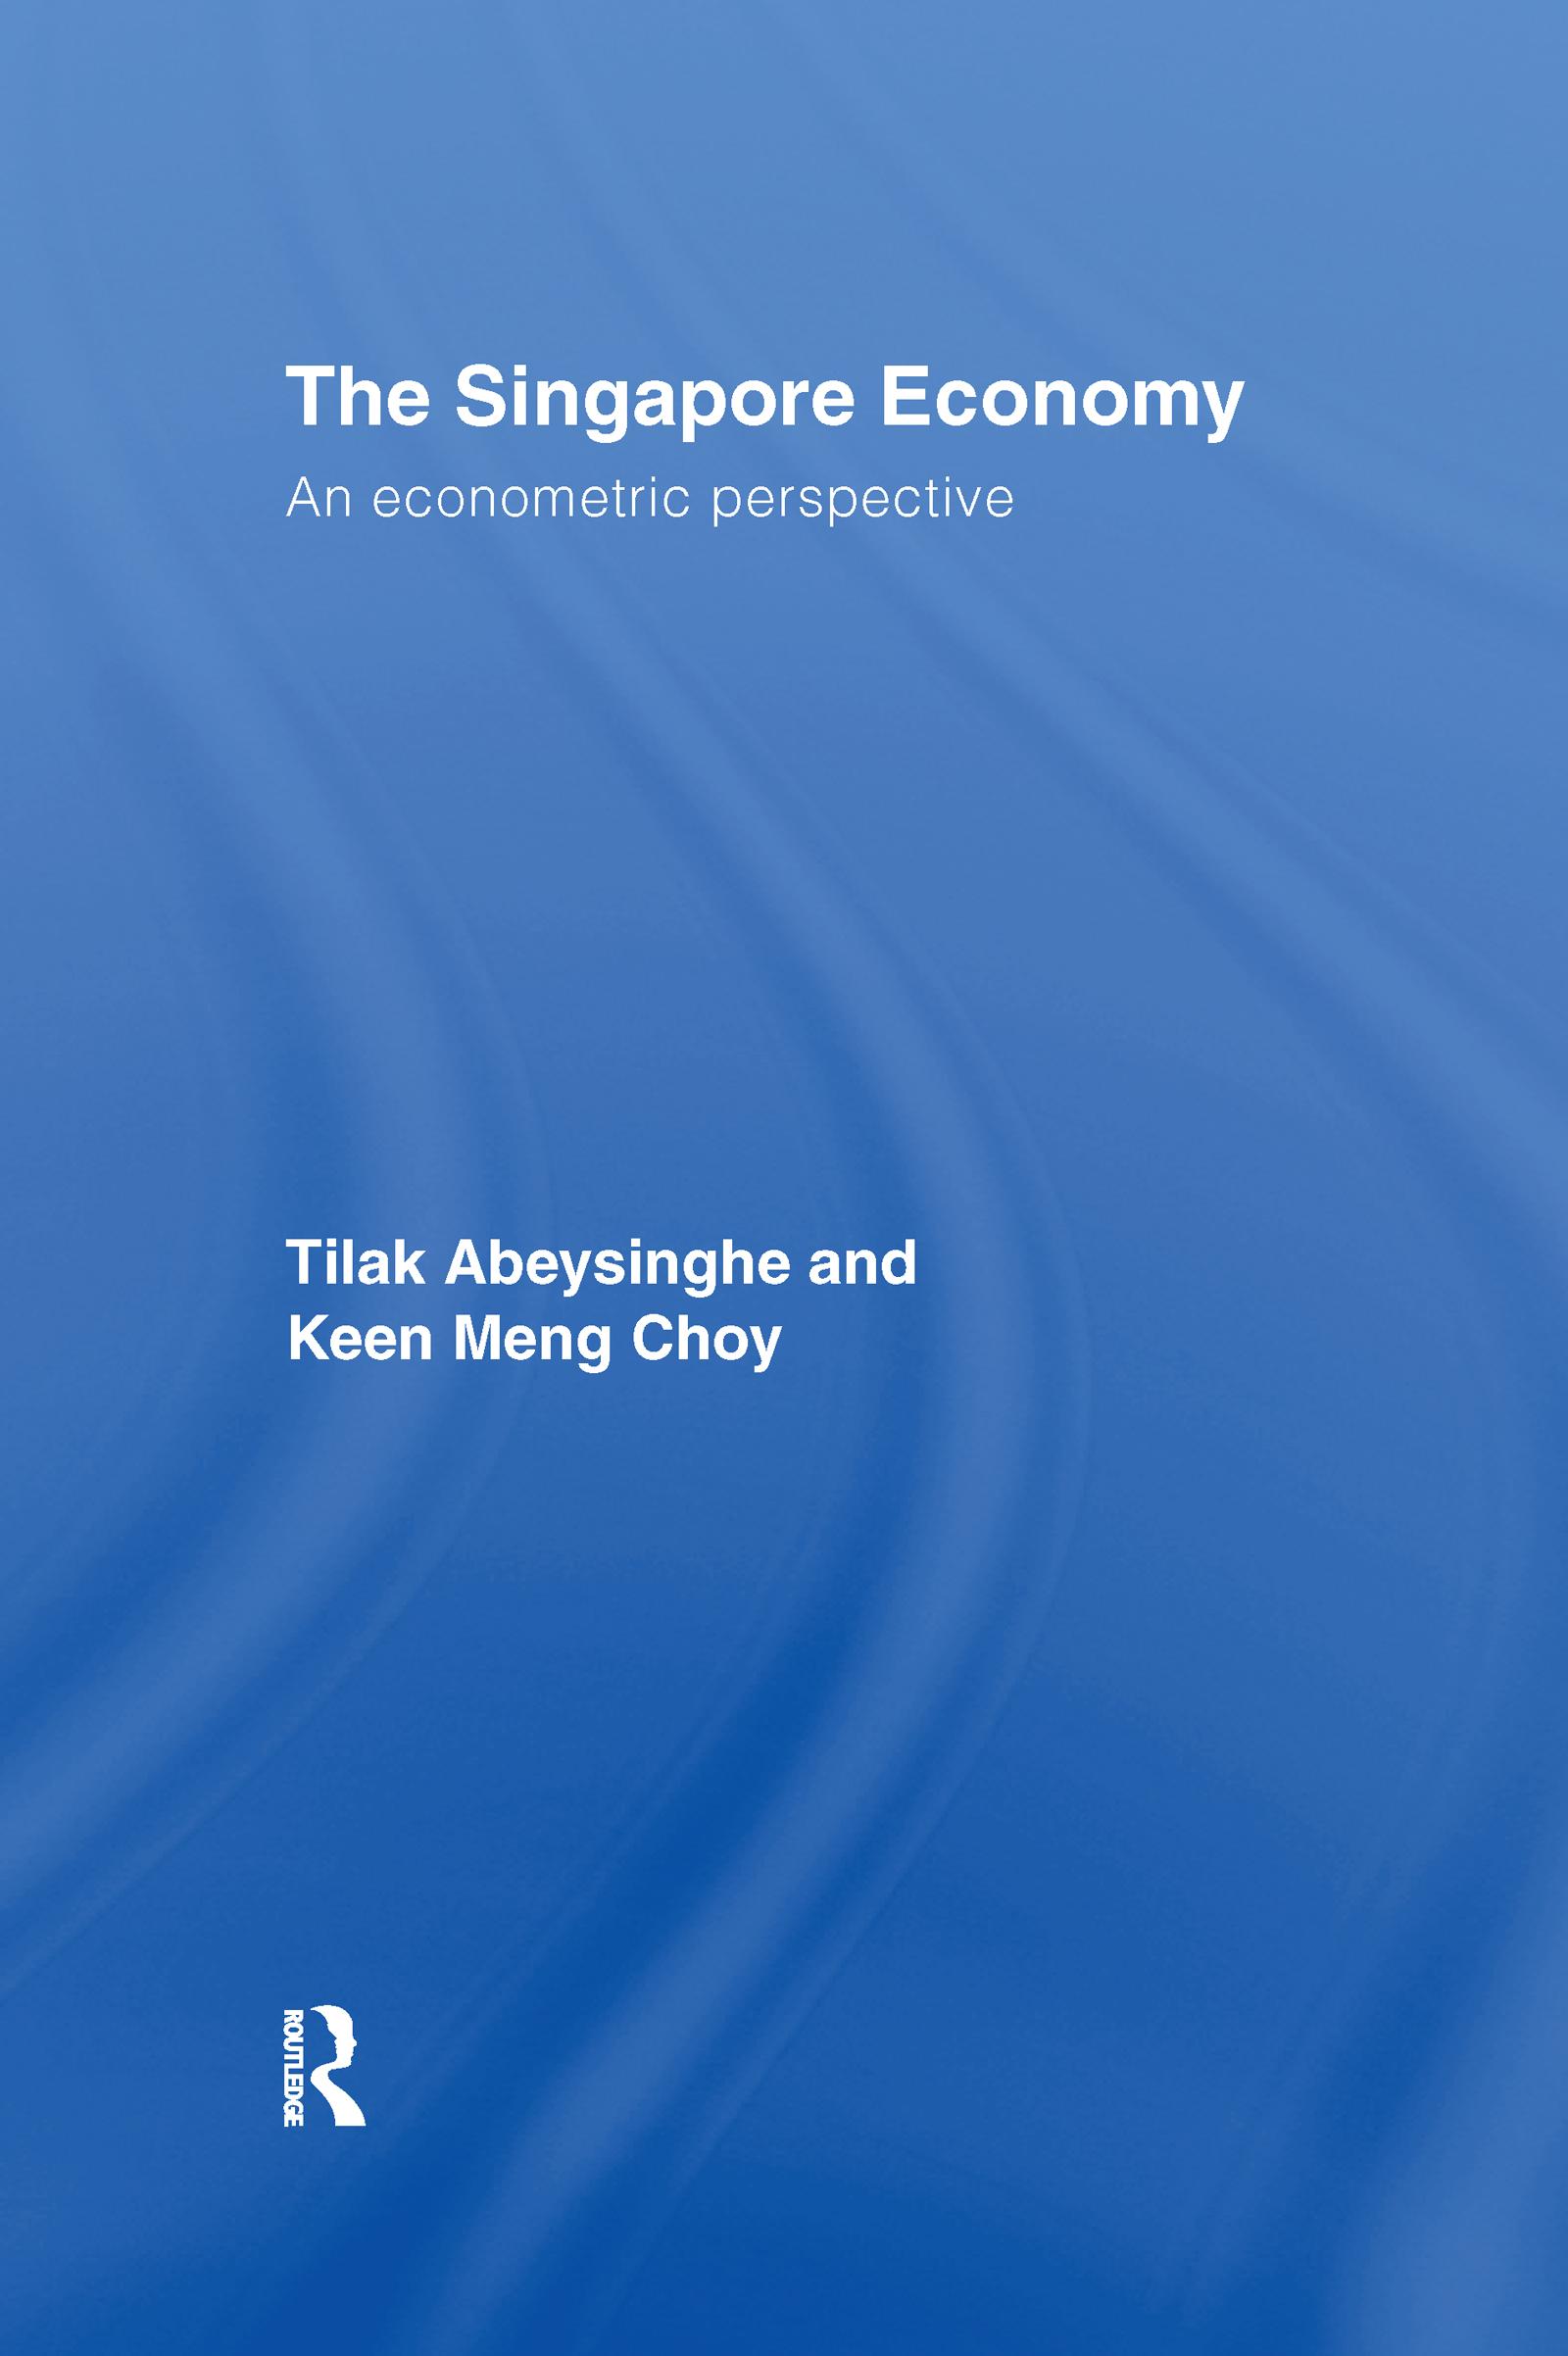 Download Ebook The Singapore Economy by Tilak Abeysinghe Pdf